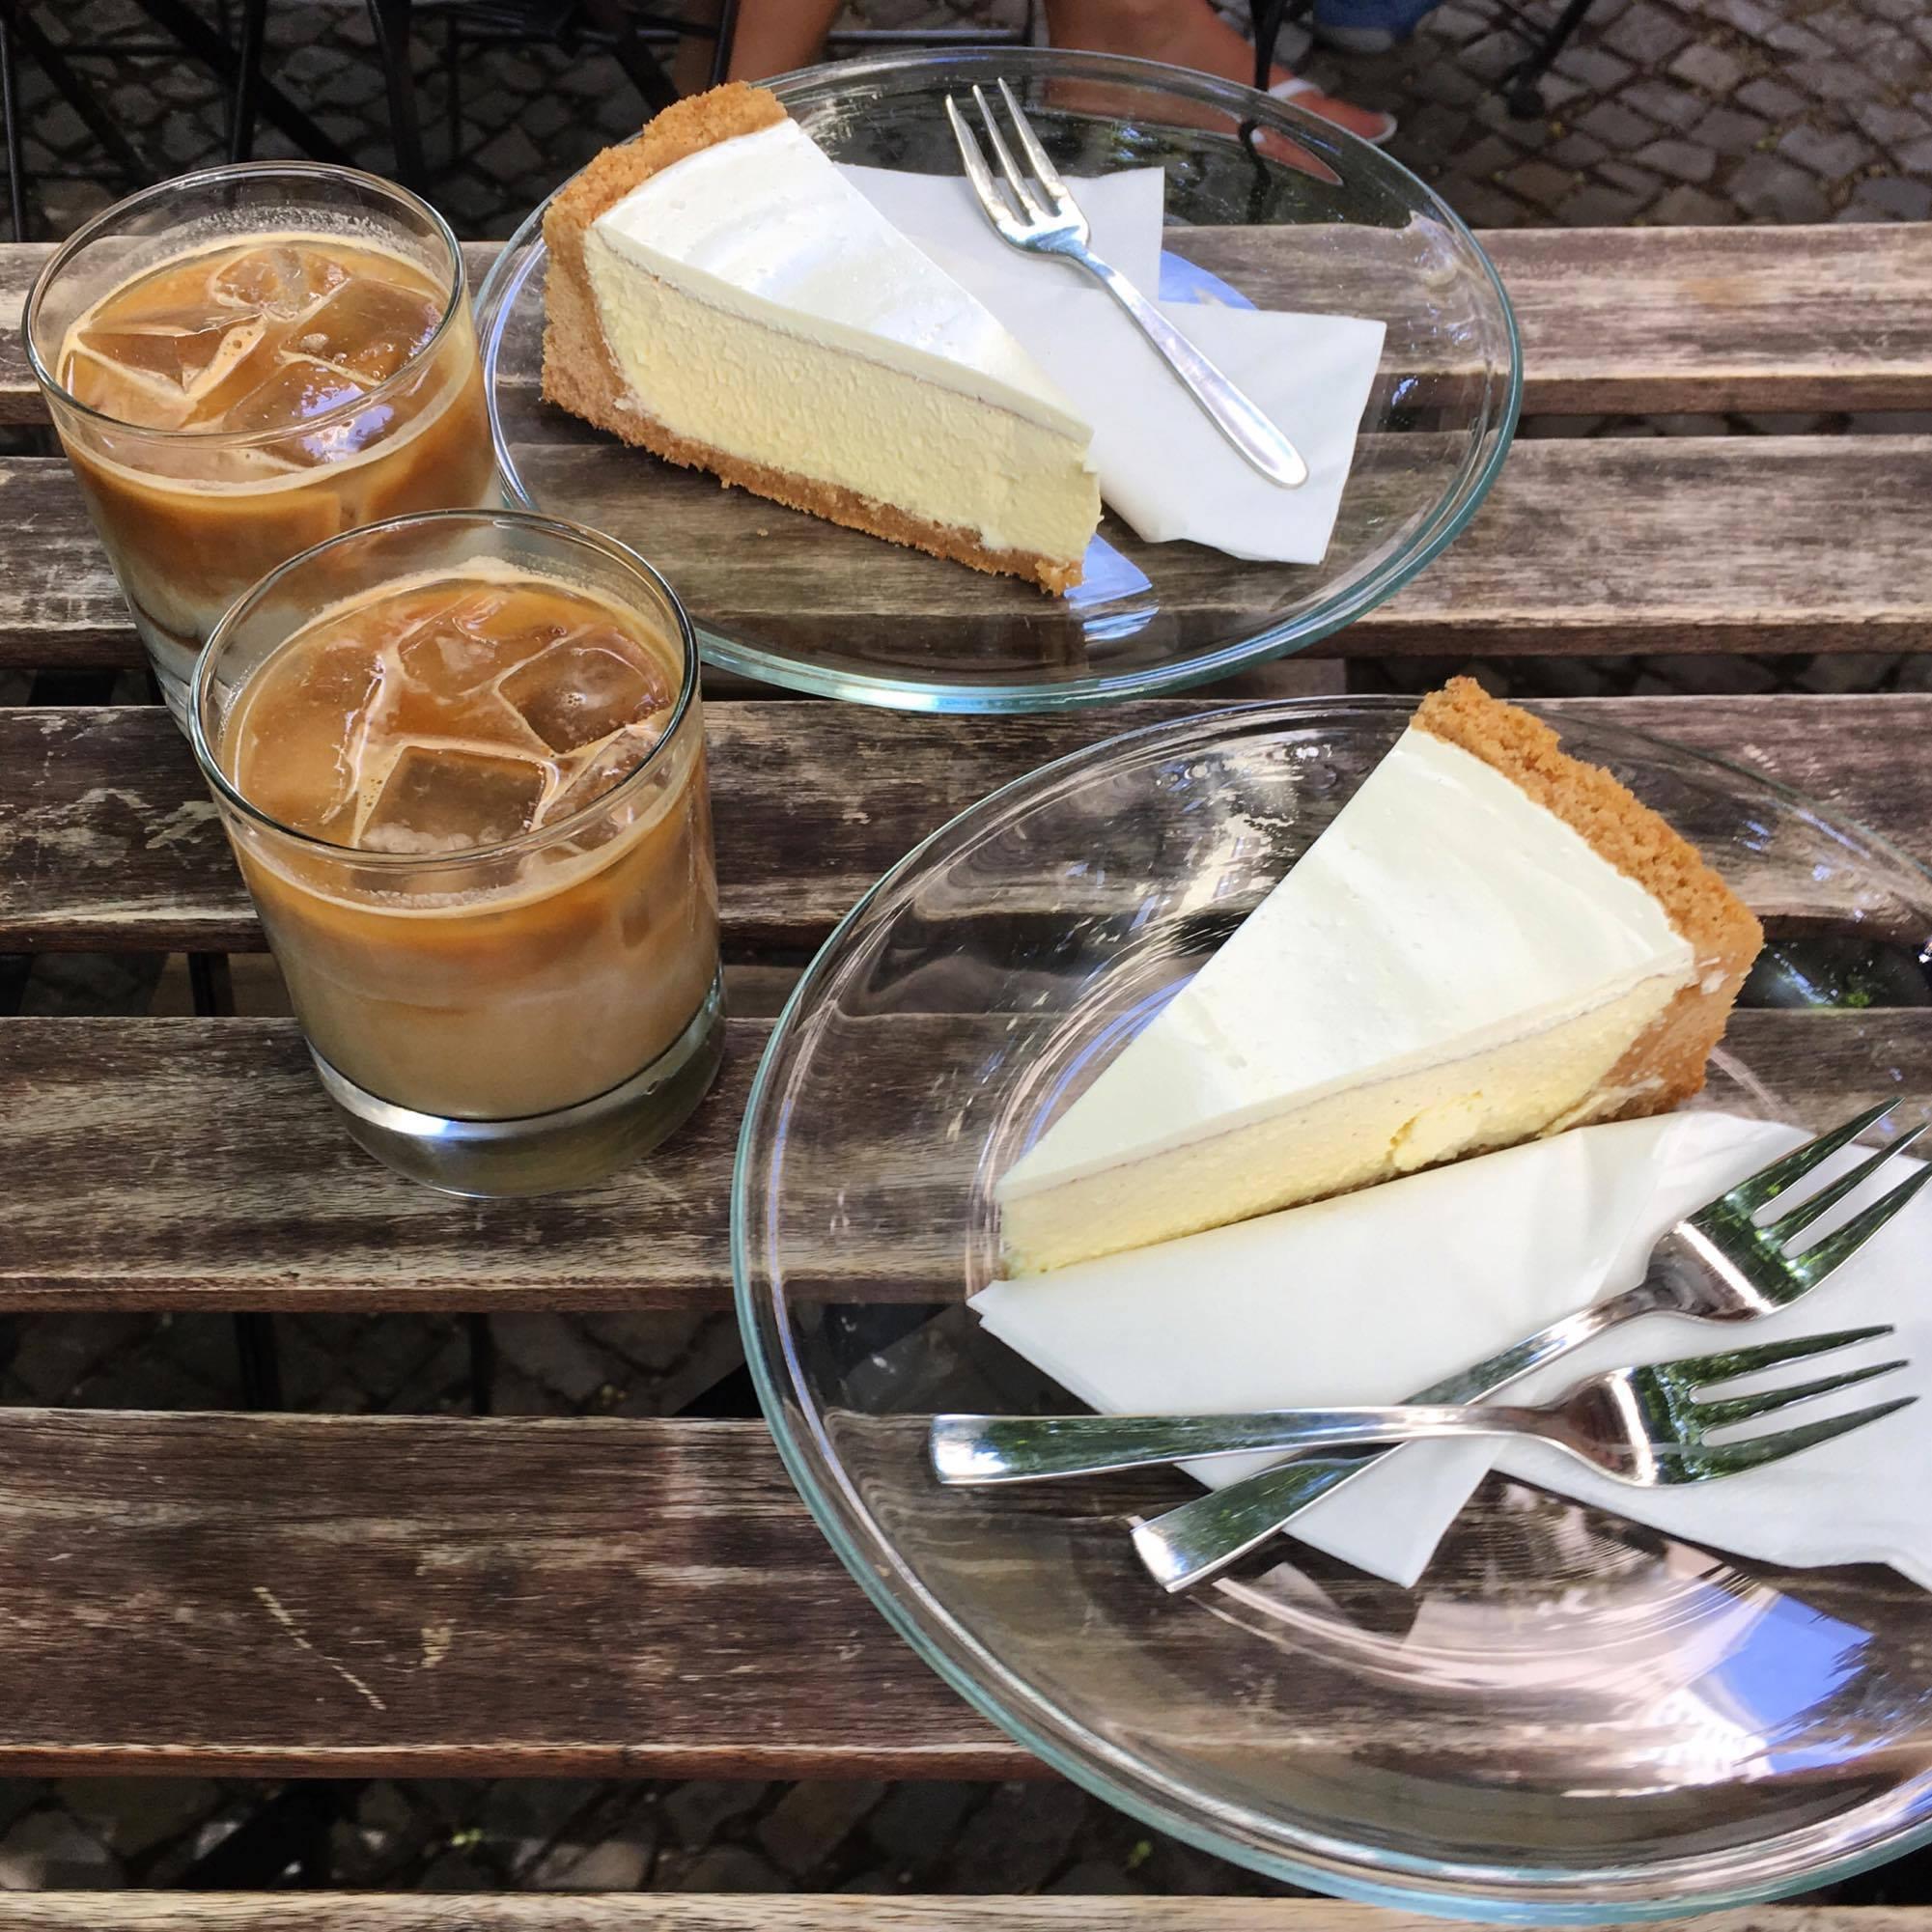 coffee and Berlin cheesecake in Kreuzberg